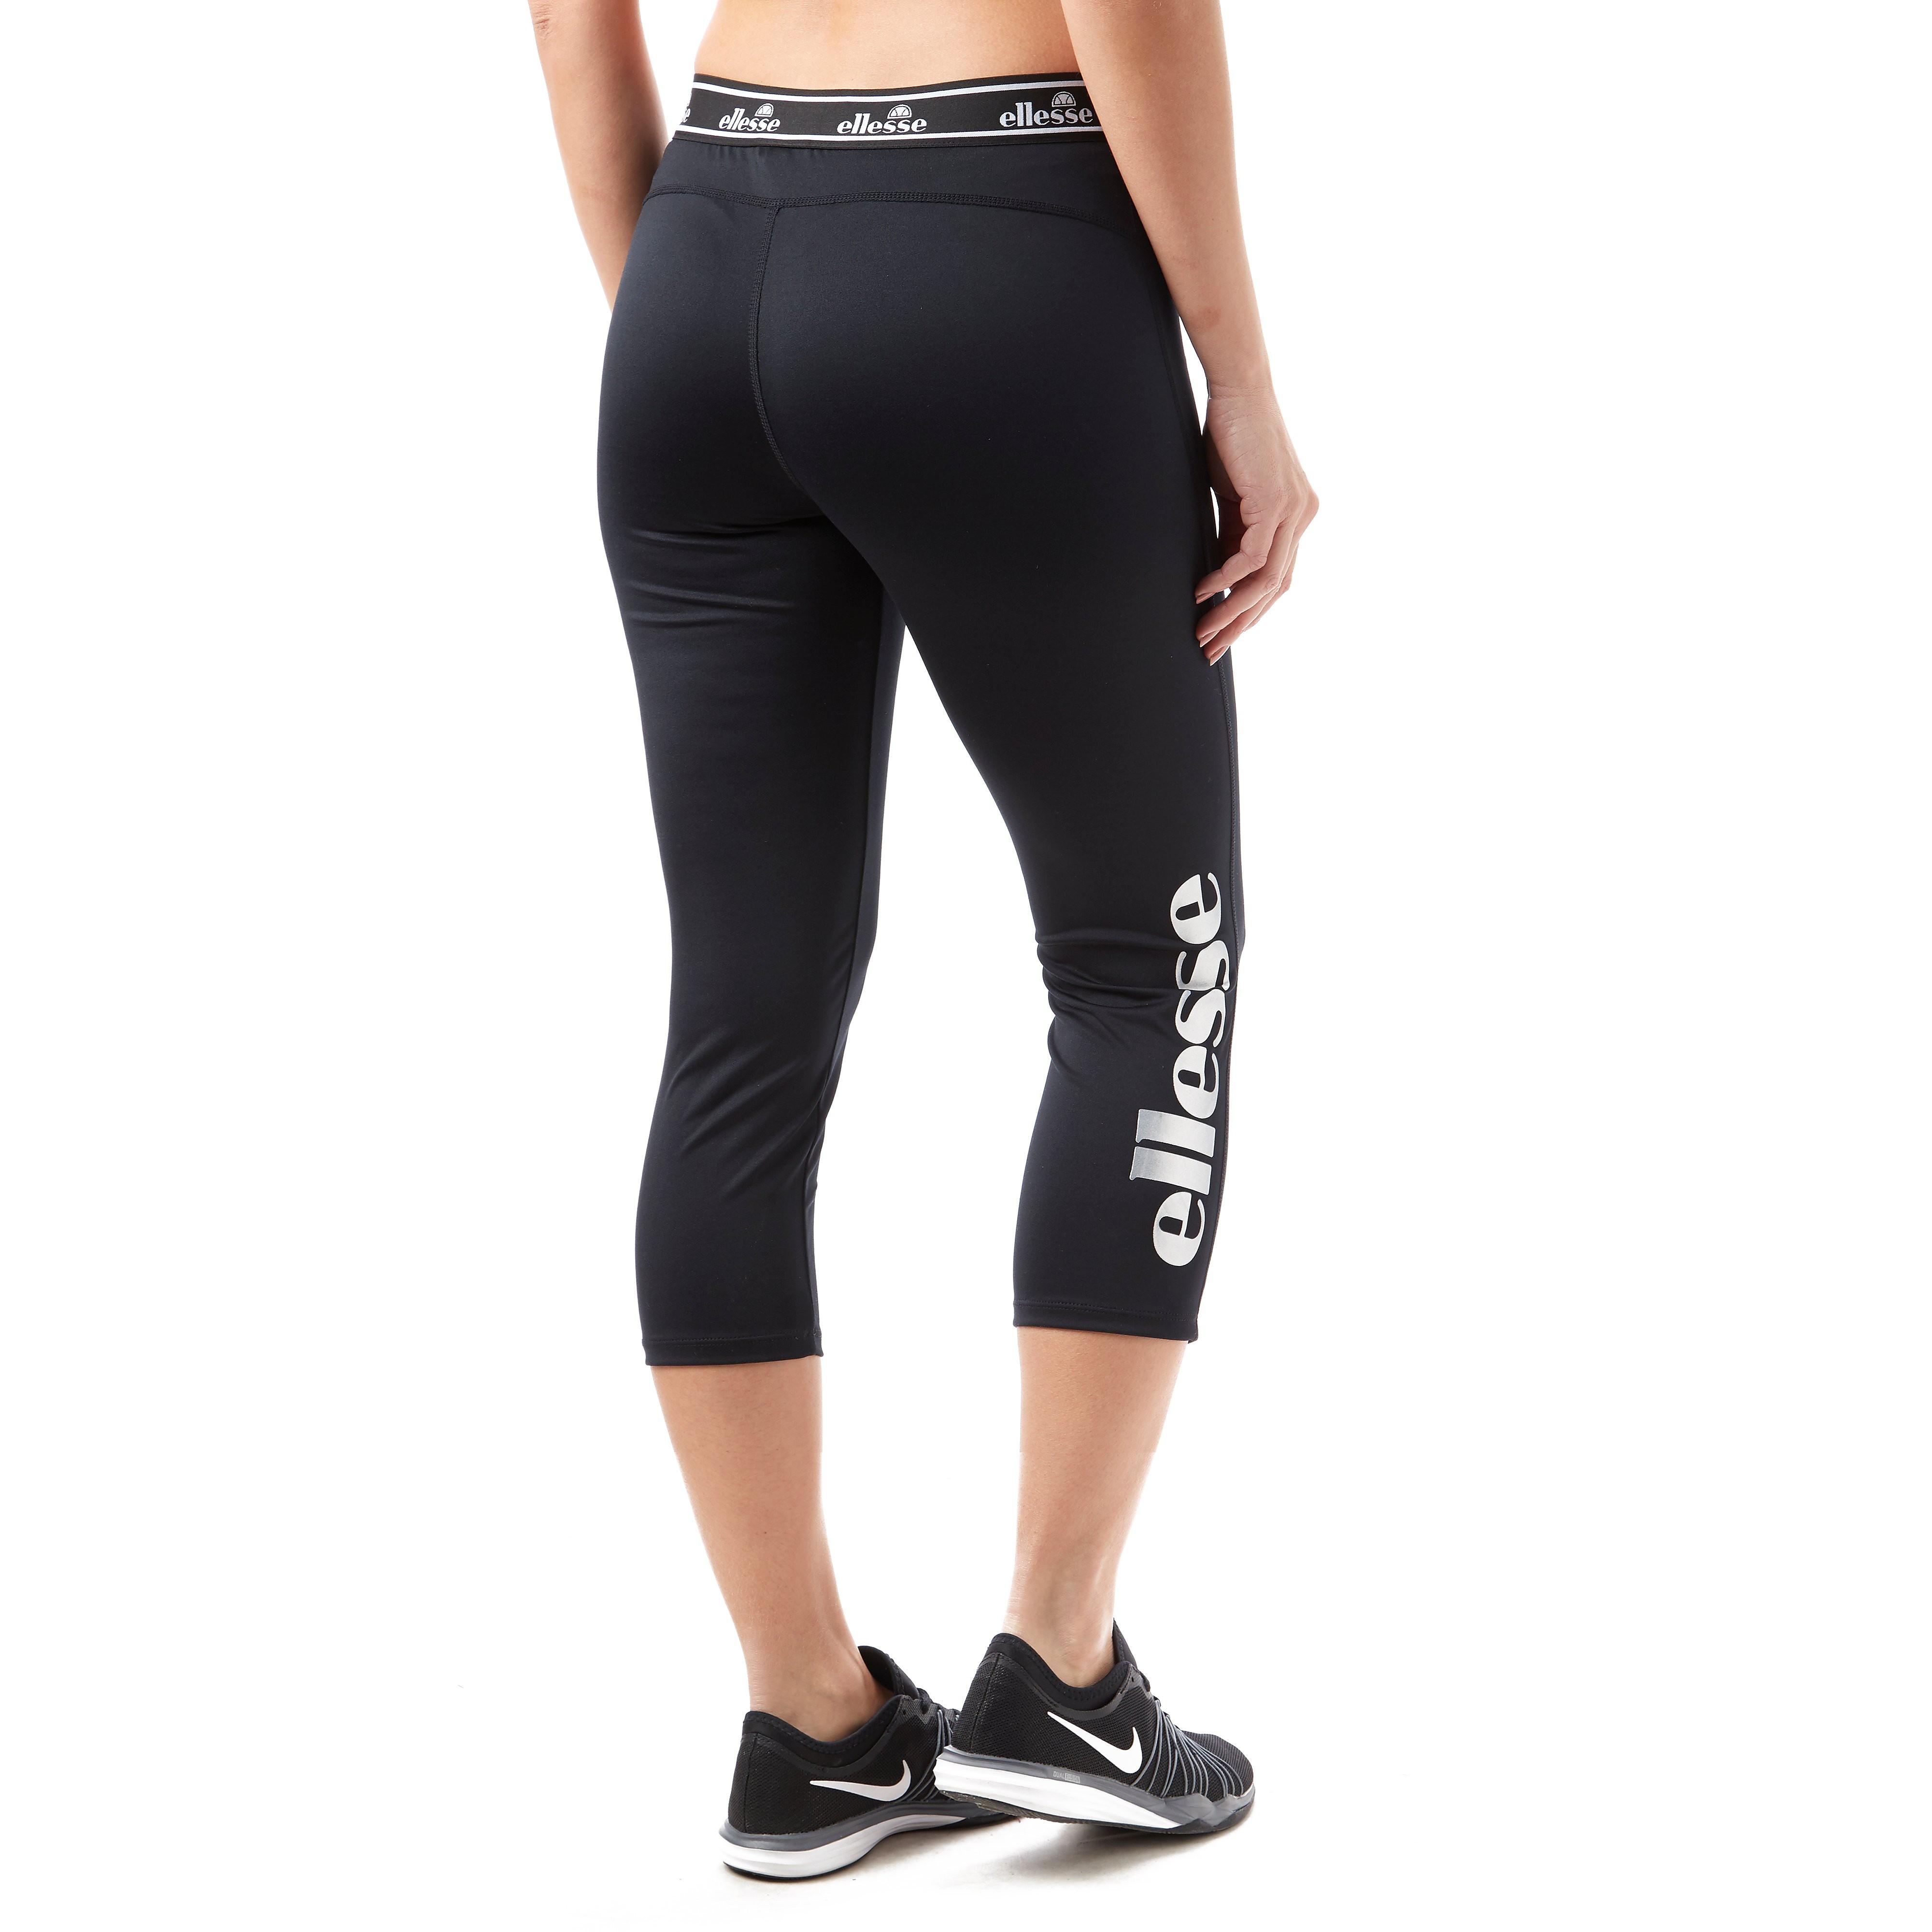 Ellesse Diana Capri Women's Running Tights